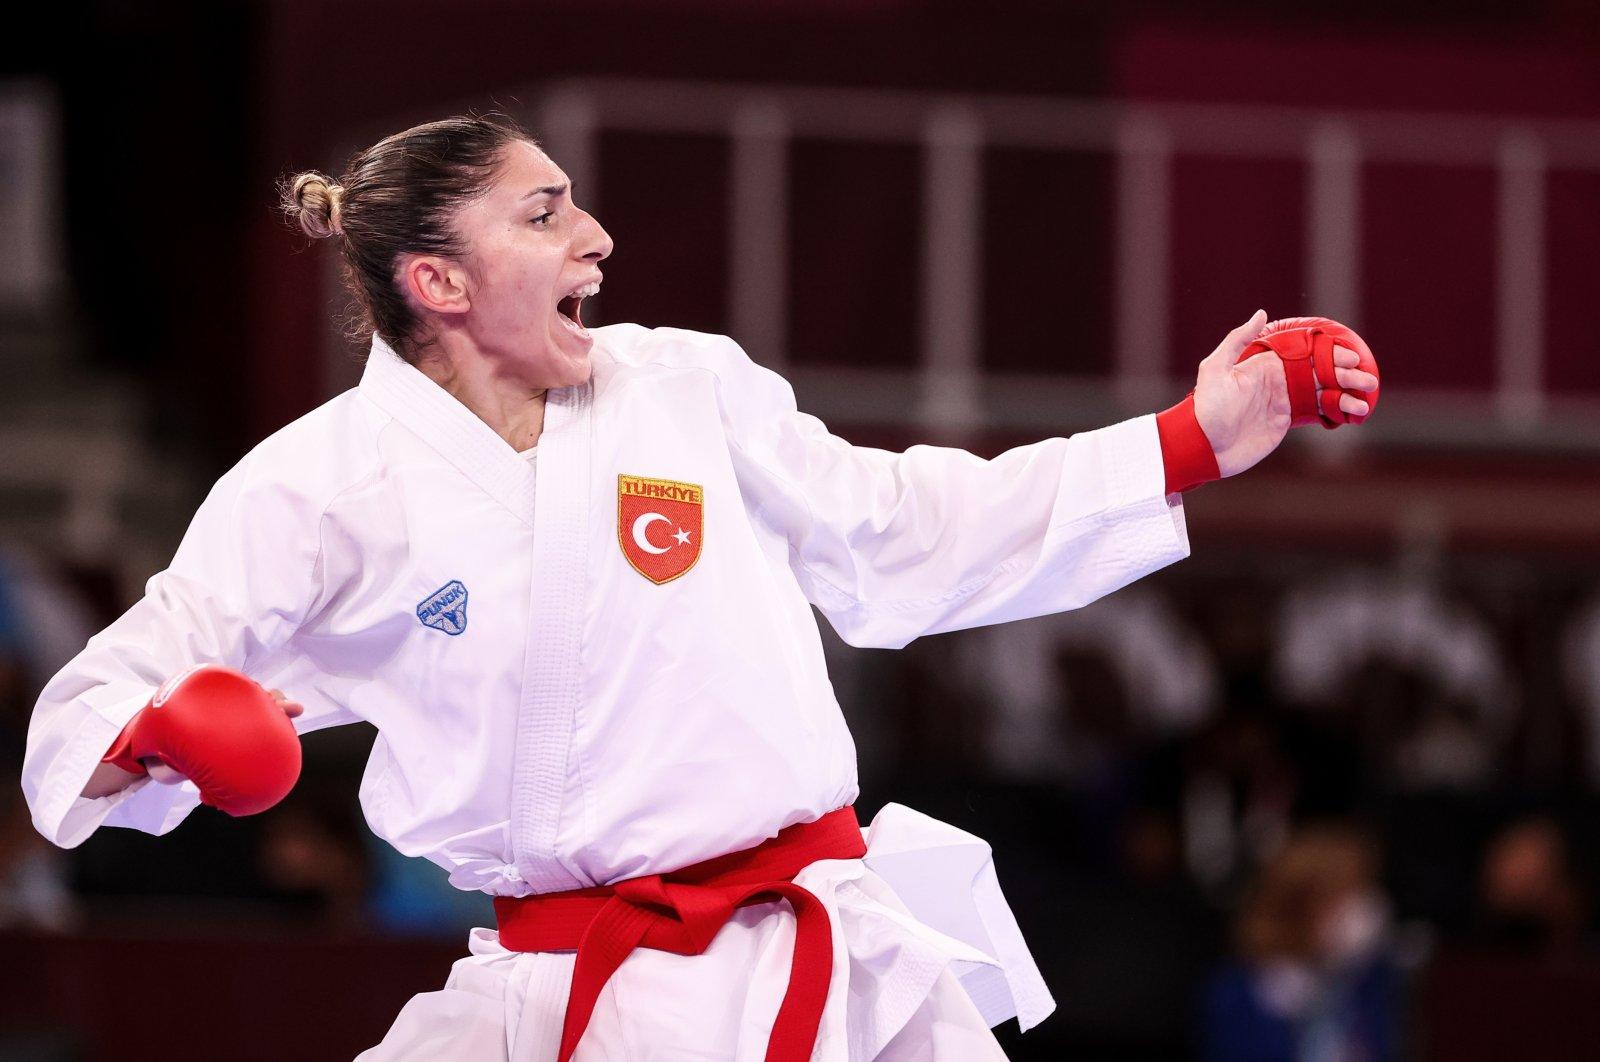 Turkey's Merve Çoban in action during a Tokyo 2020 Olympic Games women's kumite 61-kilogram karate event at the Nippon Budokan, Tokyo, Japan, Aug. 6, 2021. (AA Photo)